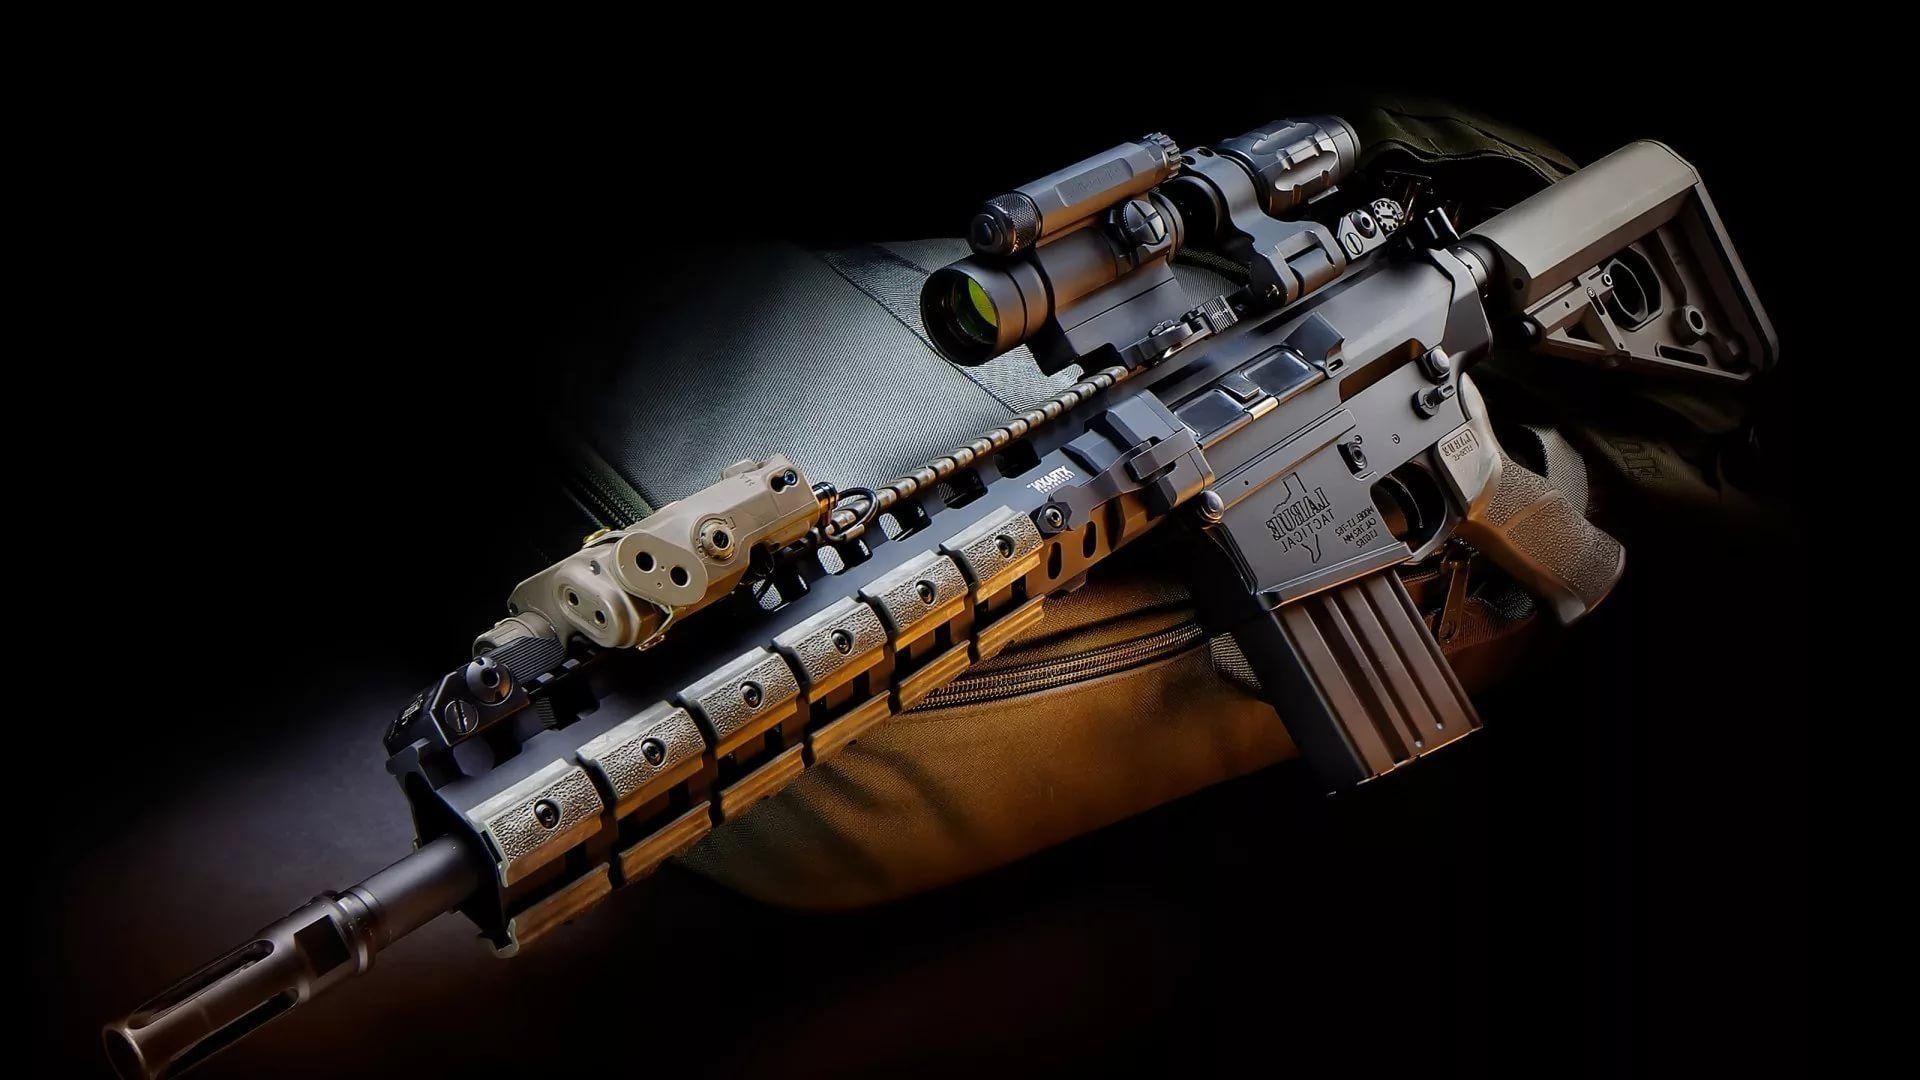 Gun For Desktop hd wallpaper 1080p for pc